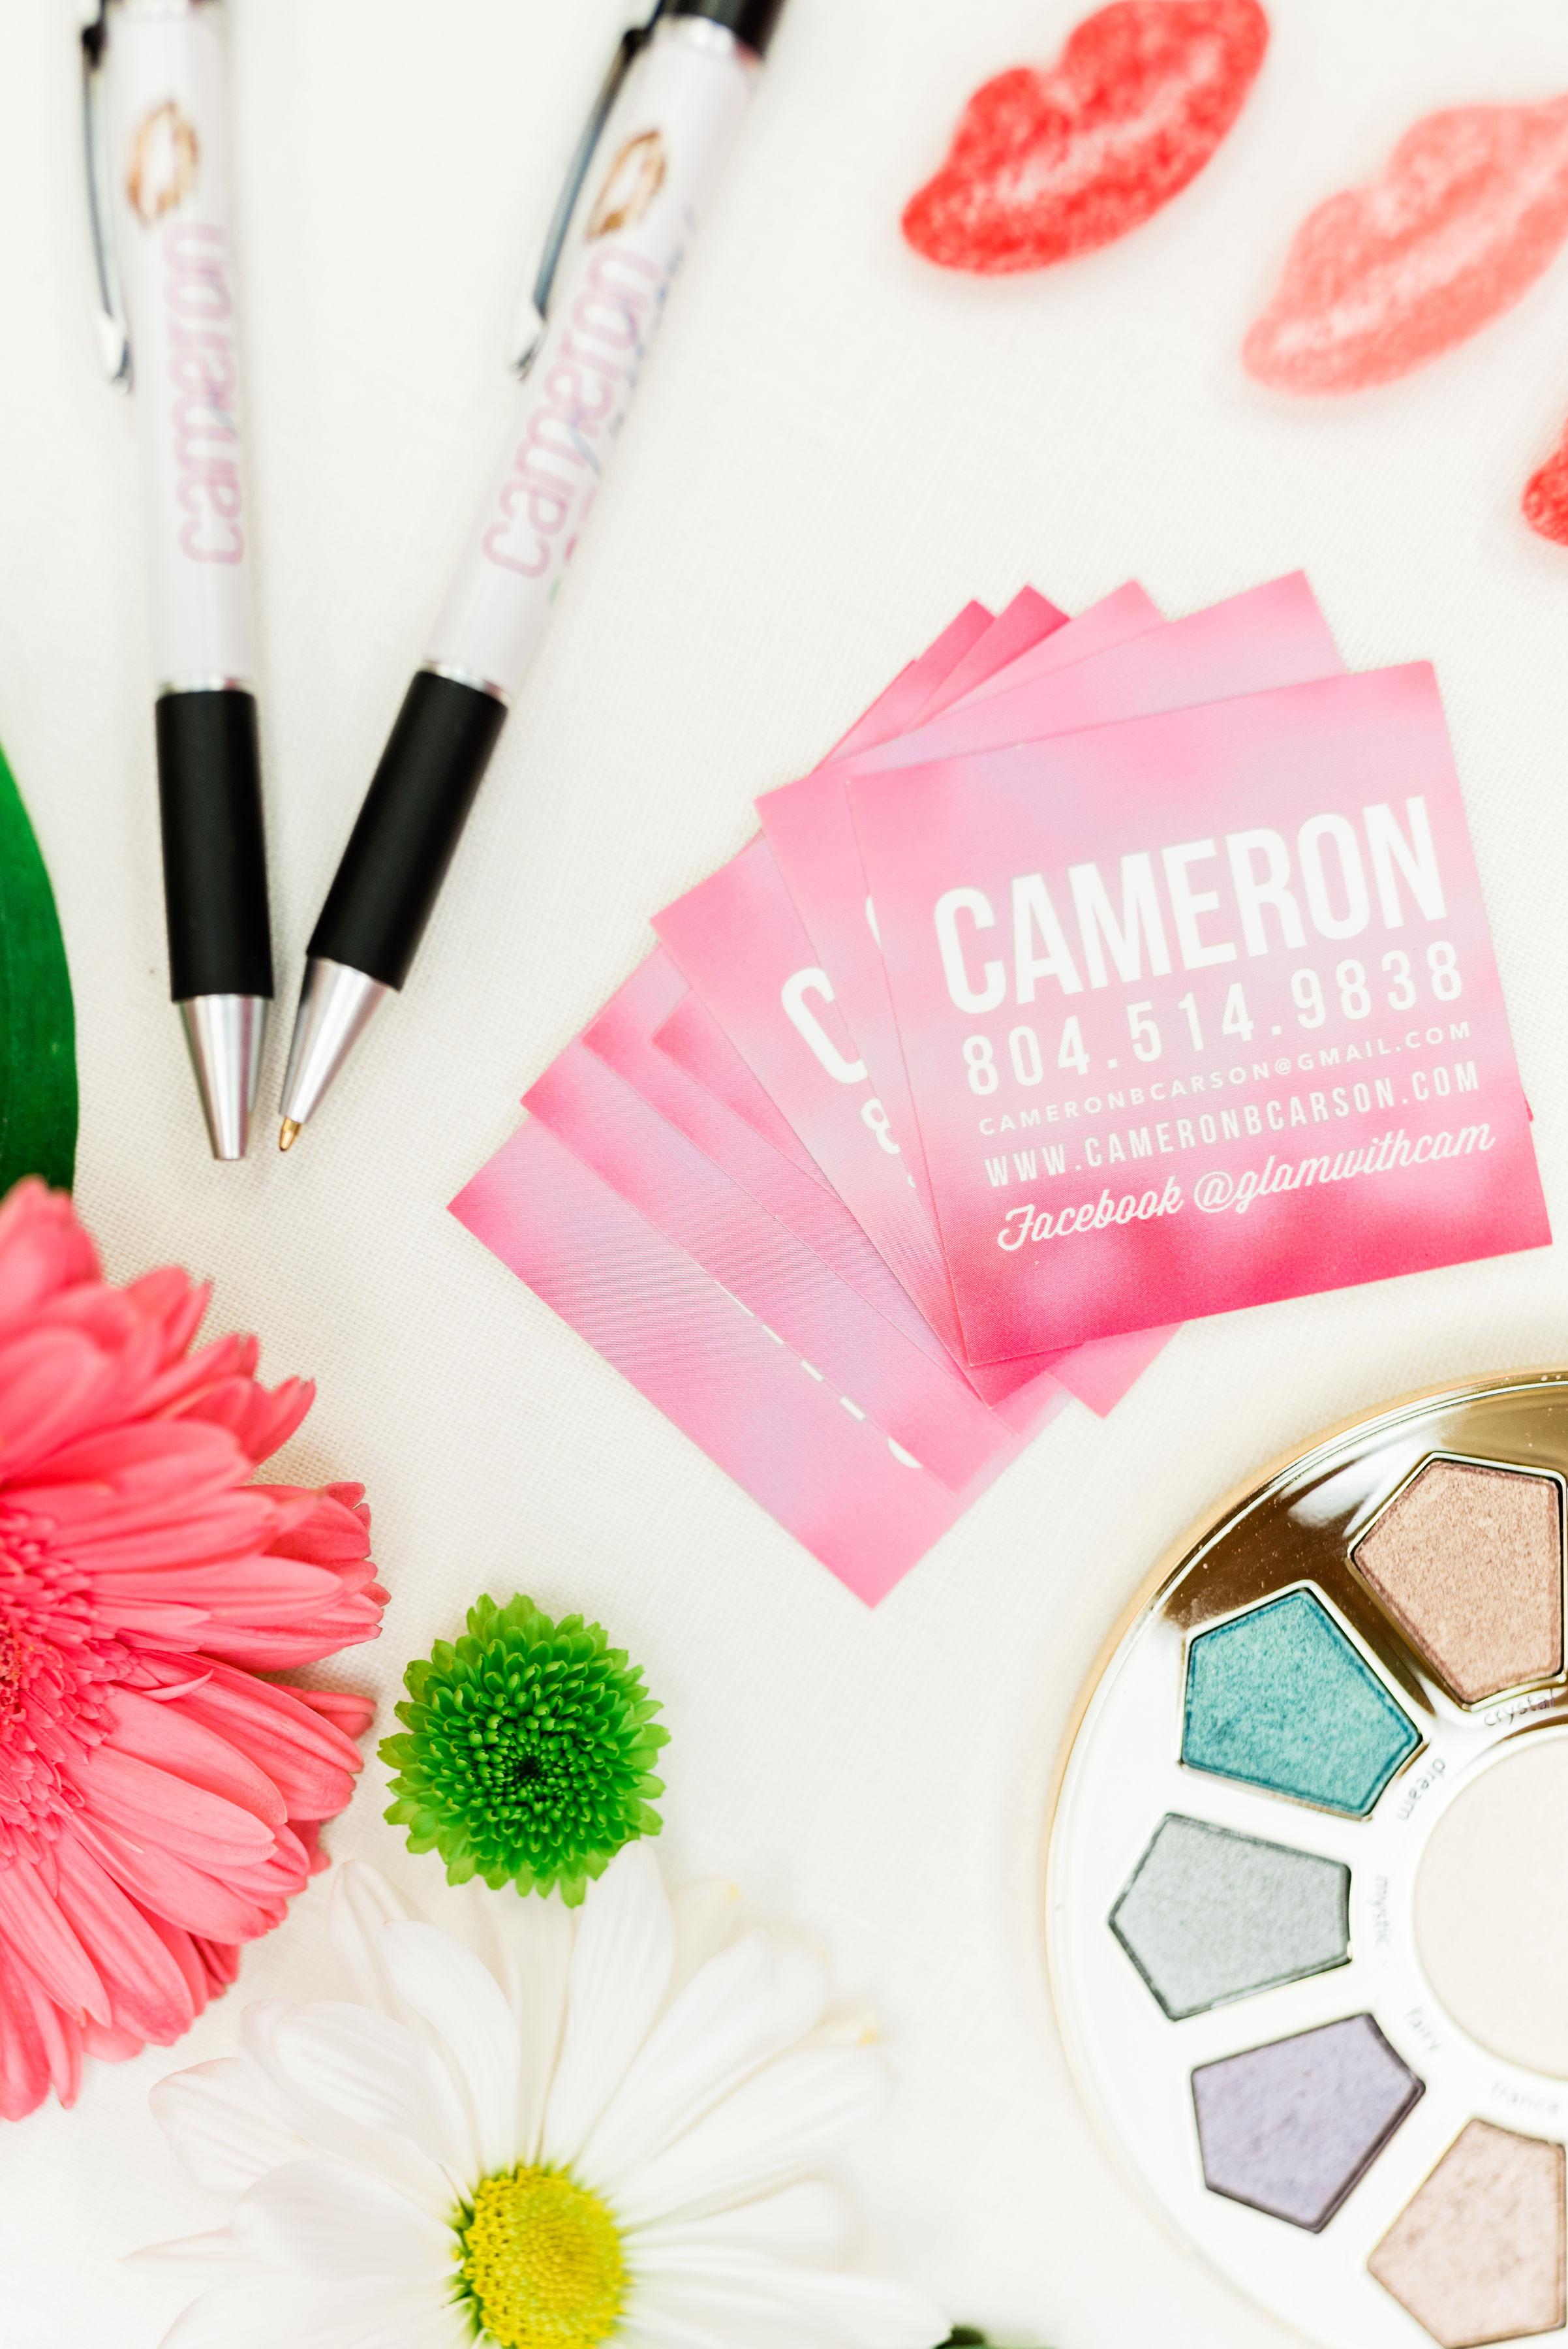 Cameron B. Carson, LLC